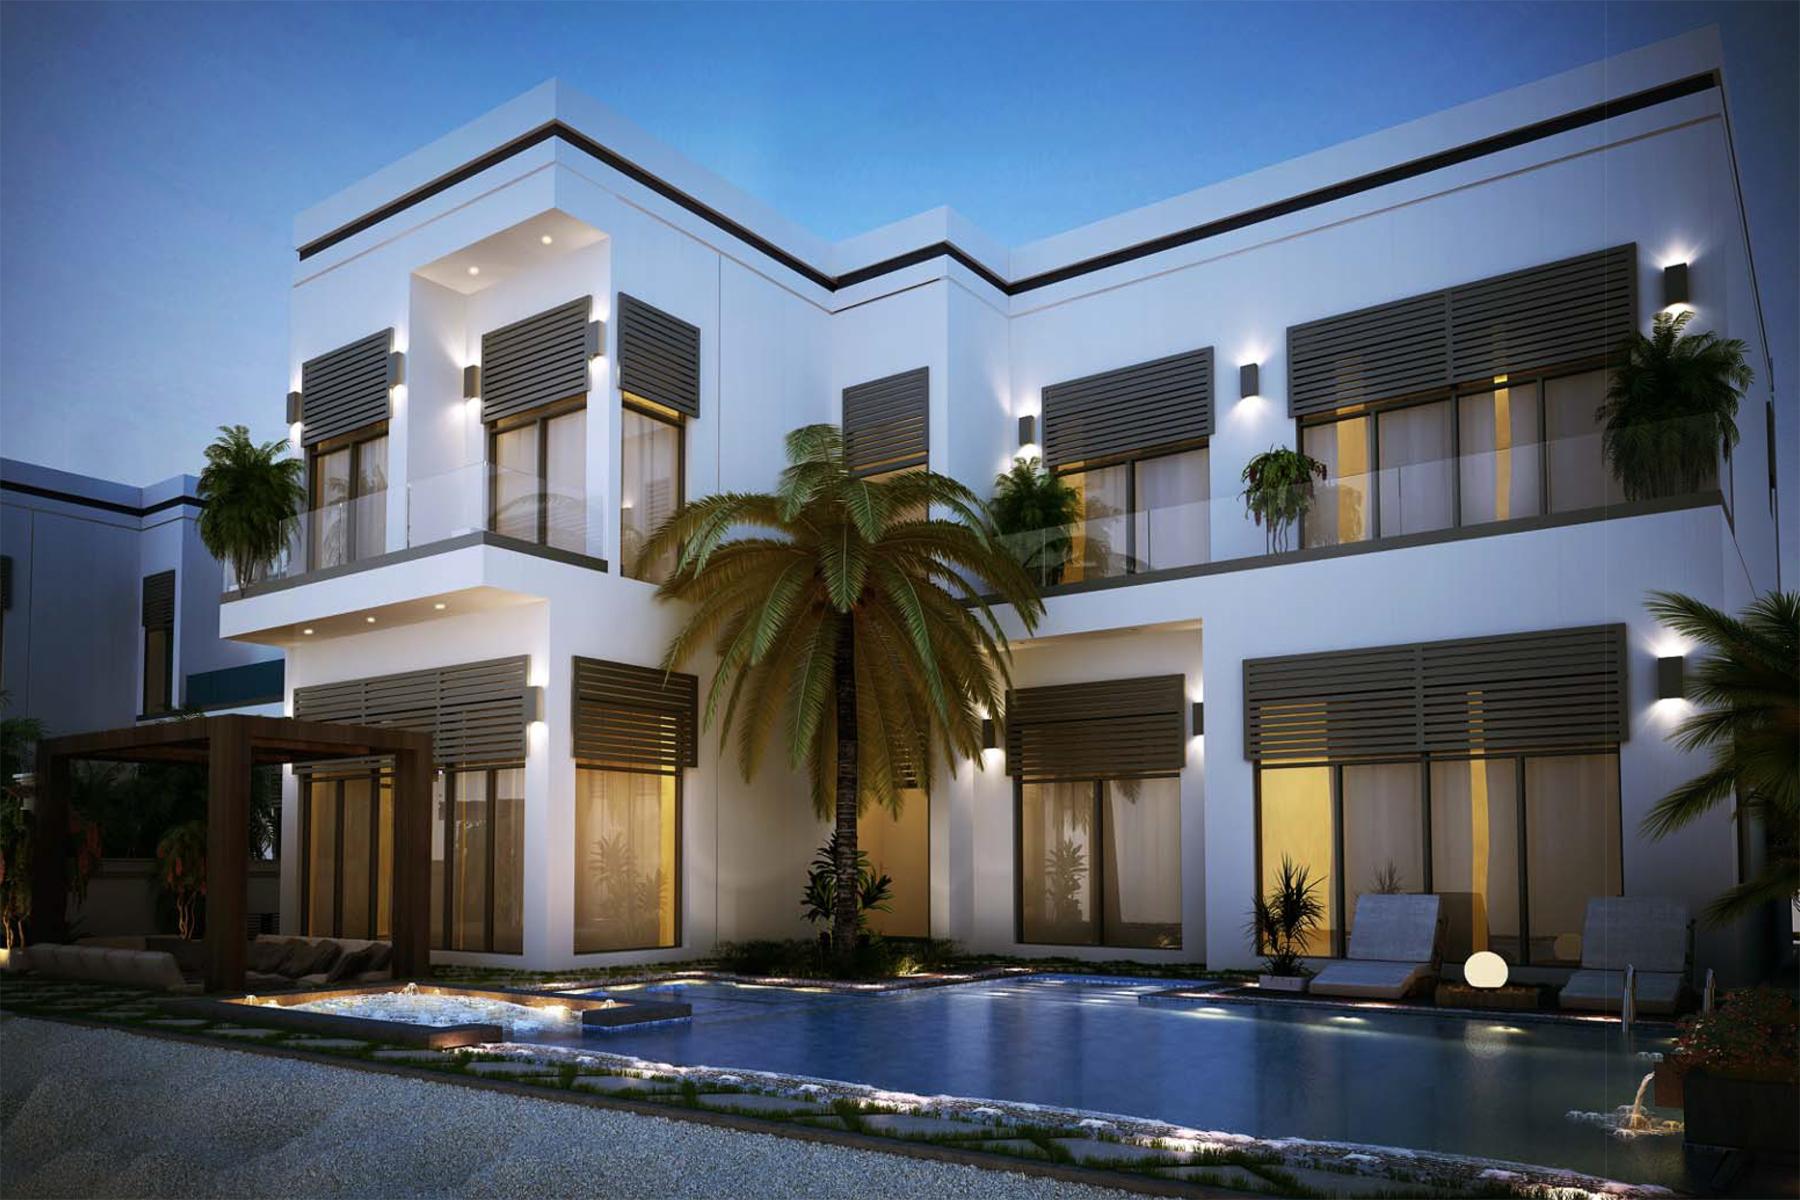 Single Family Home for Sale at Luxury Bespoke Built Villa Dubai, United Arab Emirates